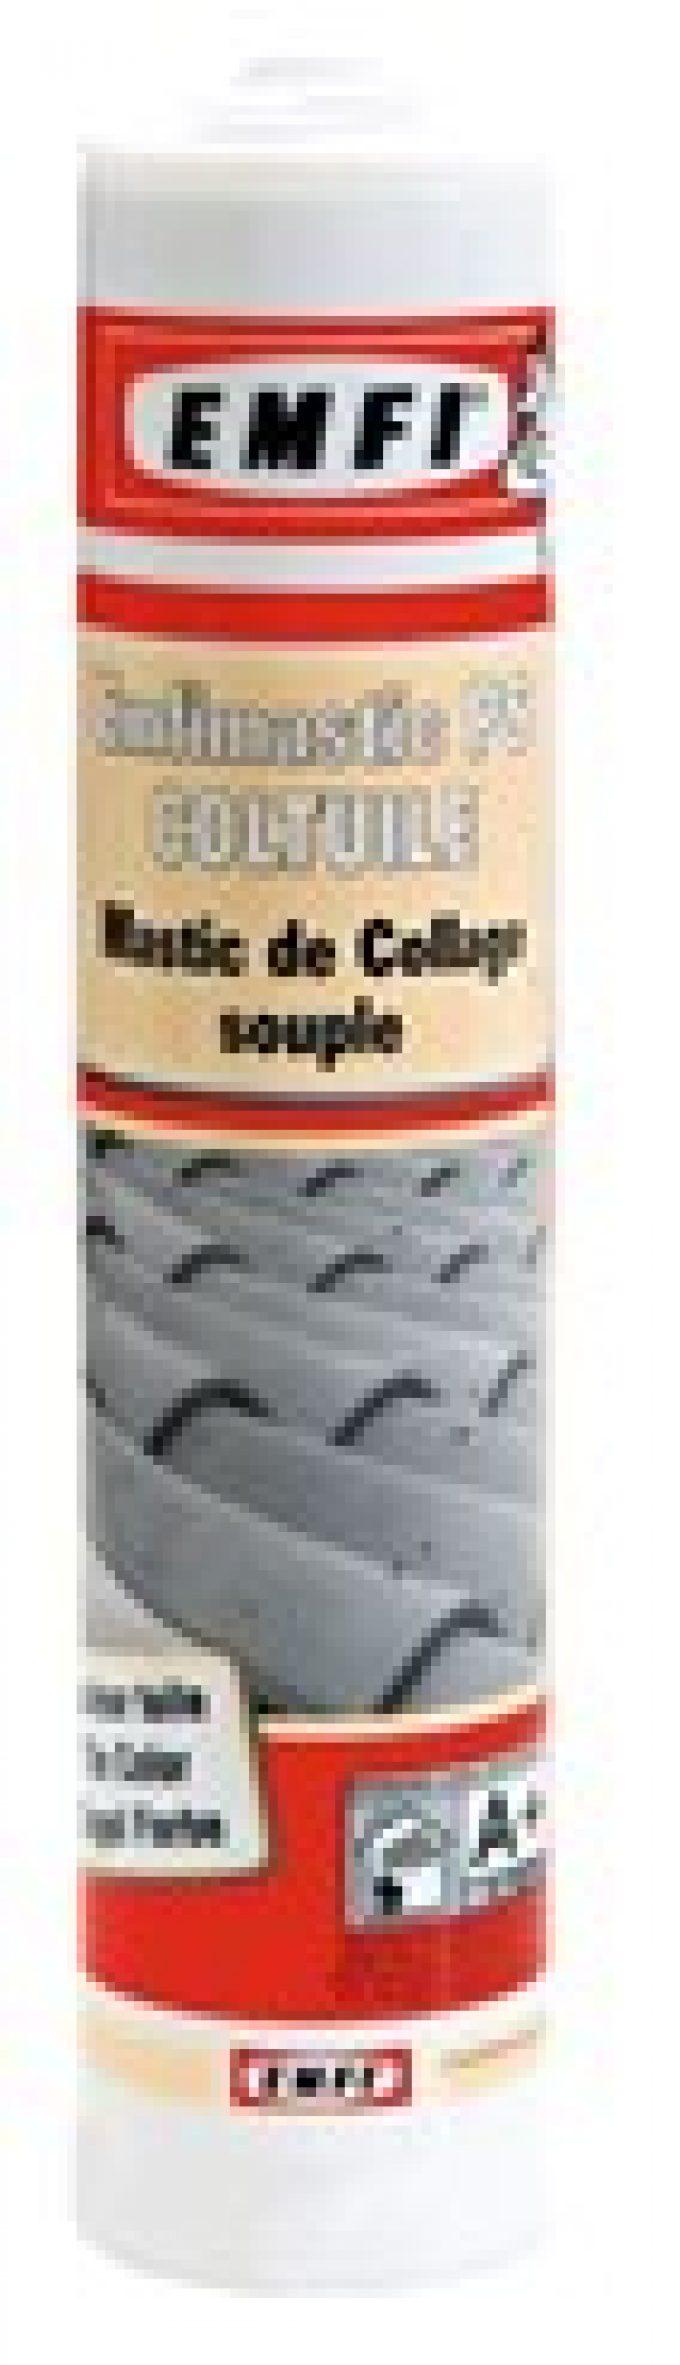 Emfimastic PS Coltuile (290 ml cartridge) – Hybrid Sealant